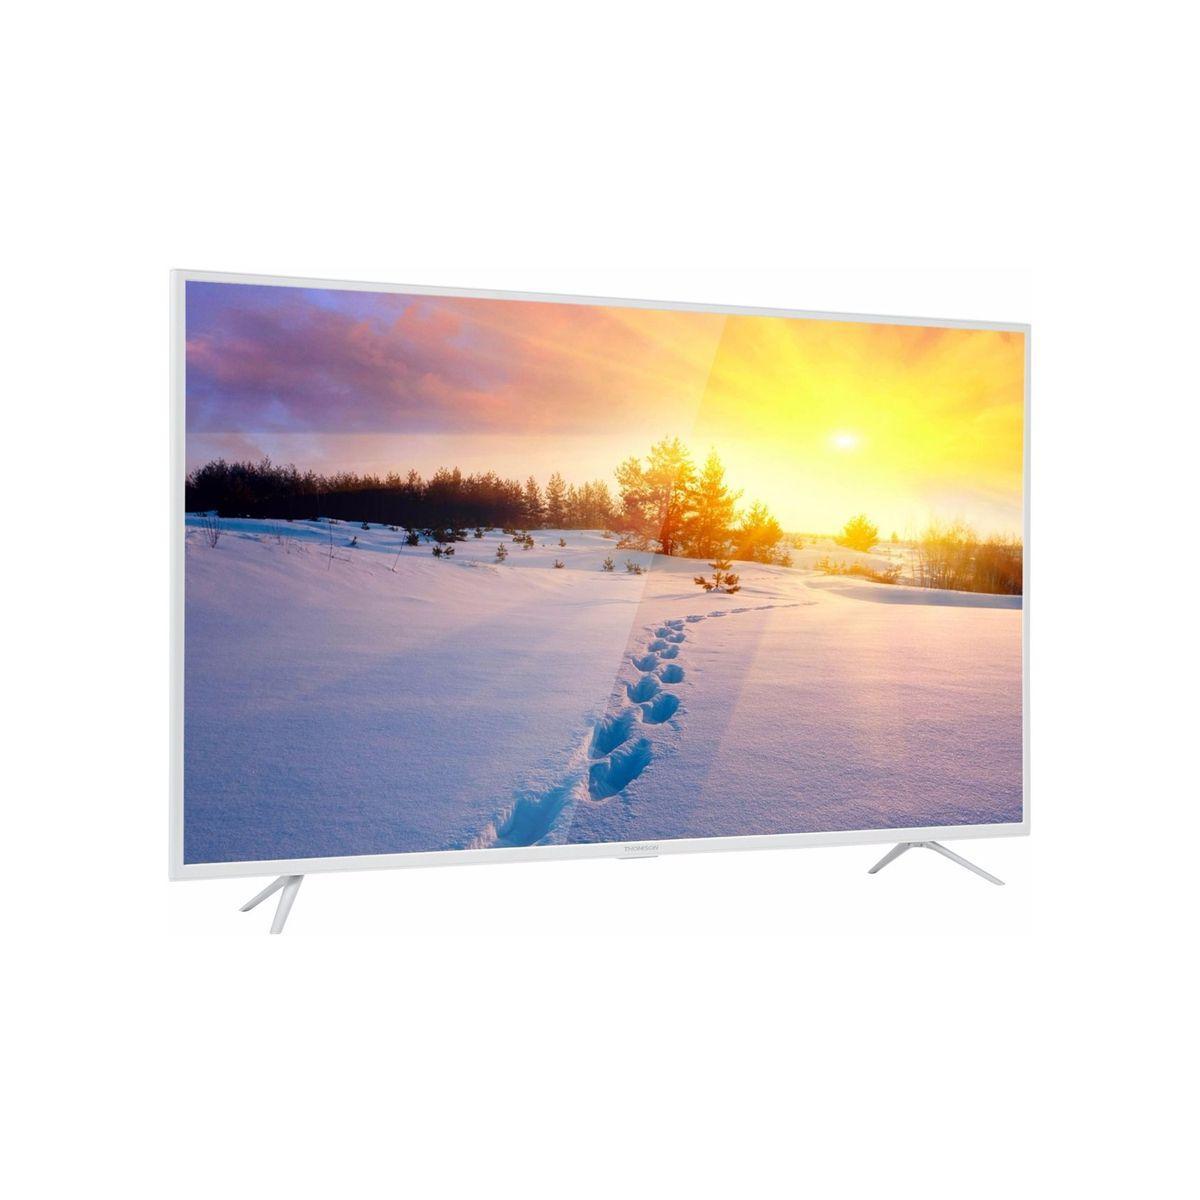 Телевизор Thomson 50UA6406W (50 дюймов / 1200Гц / Ultra HD / 4K / Smart TV / Android / Wi-Fi / DVB-T2/S2)